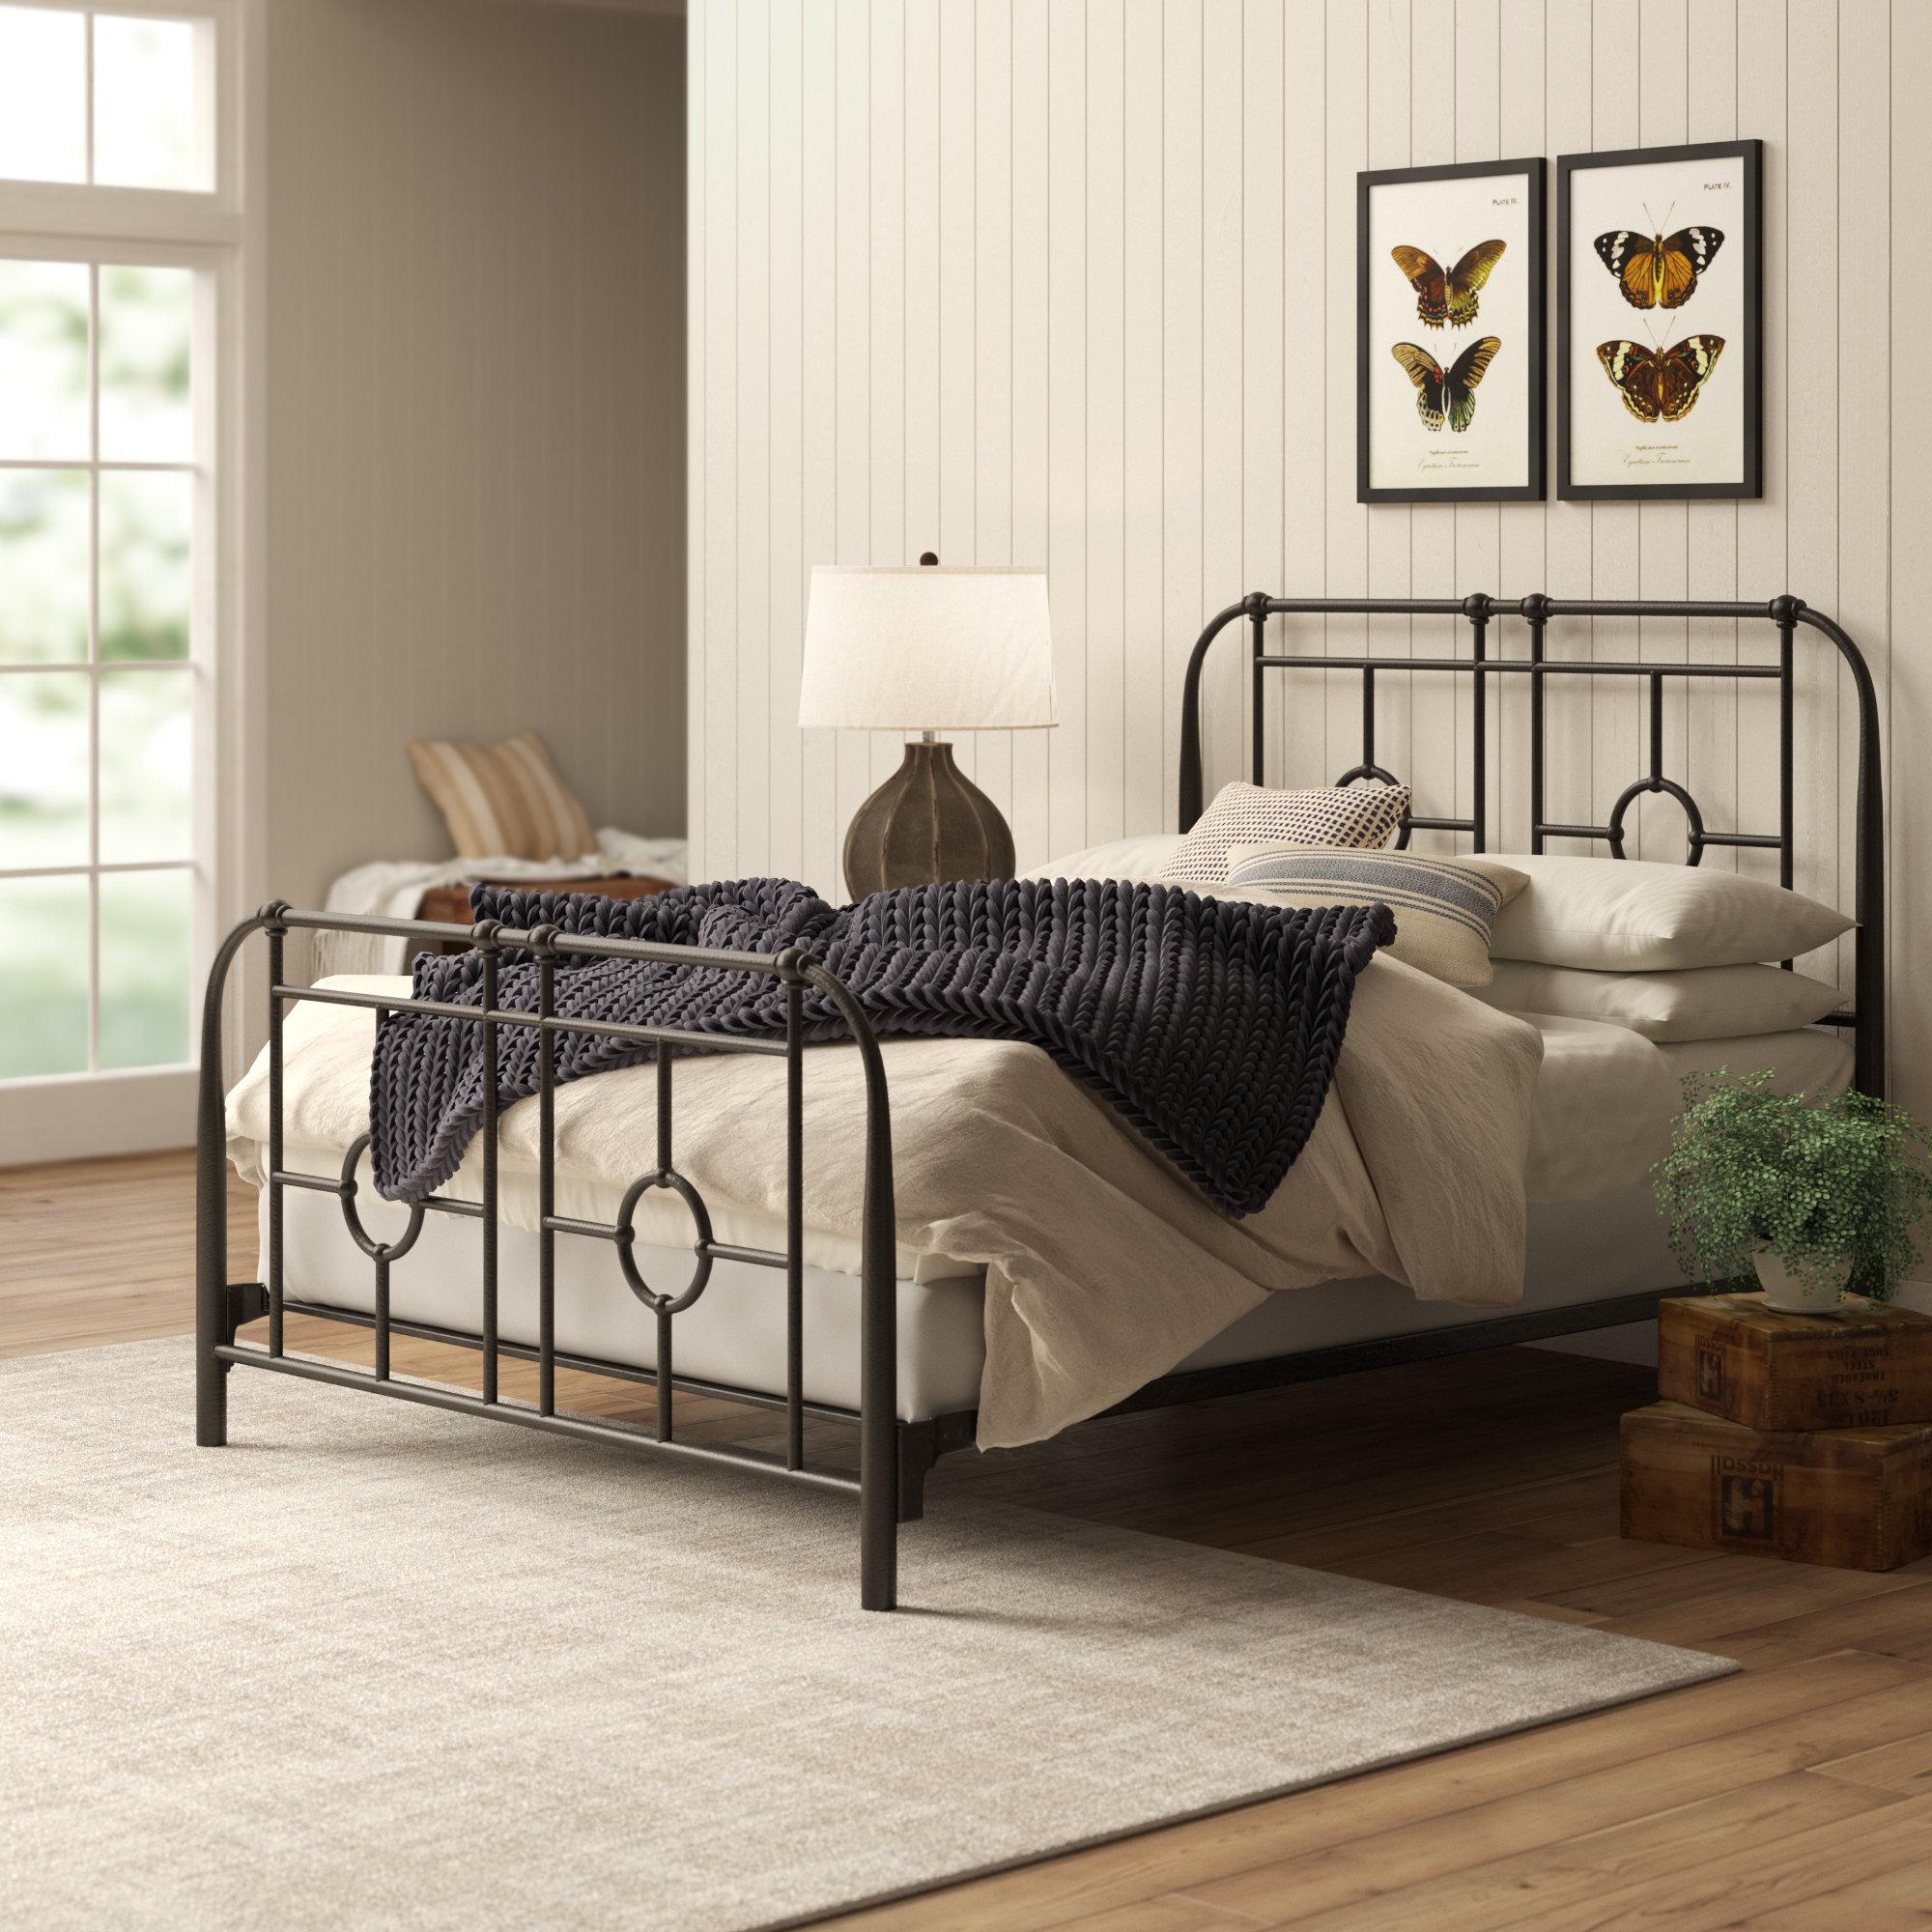 Laurel Foundry Modern Farmhouse Gwen Standard Bed Reviews Wayfair